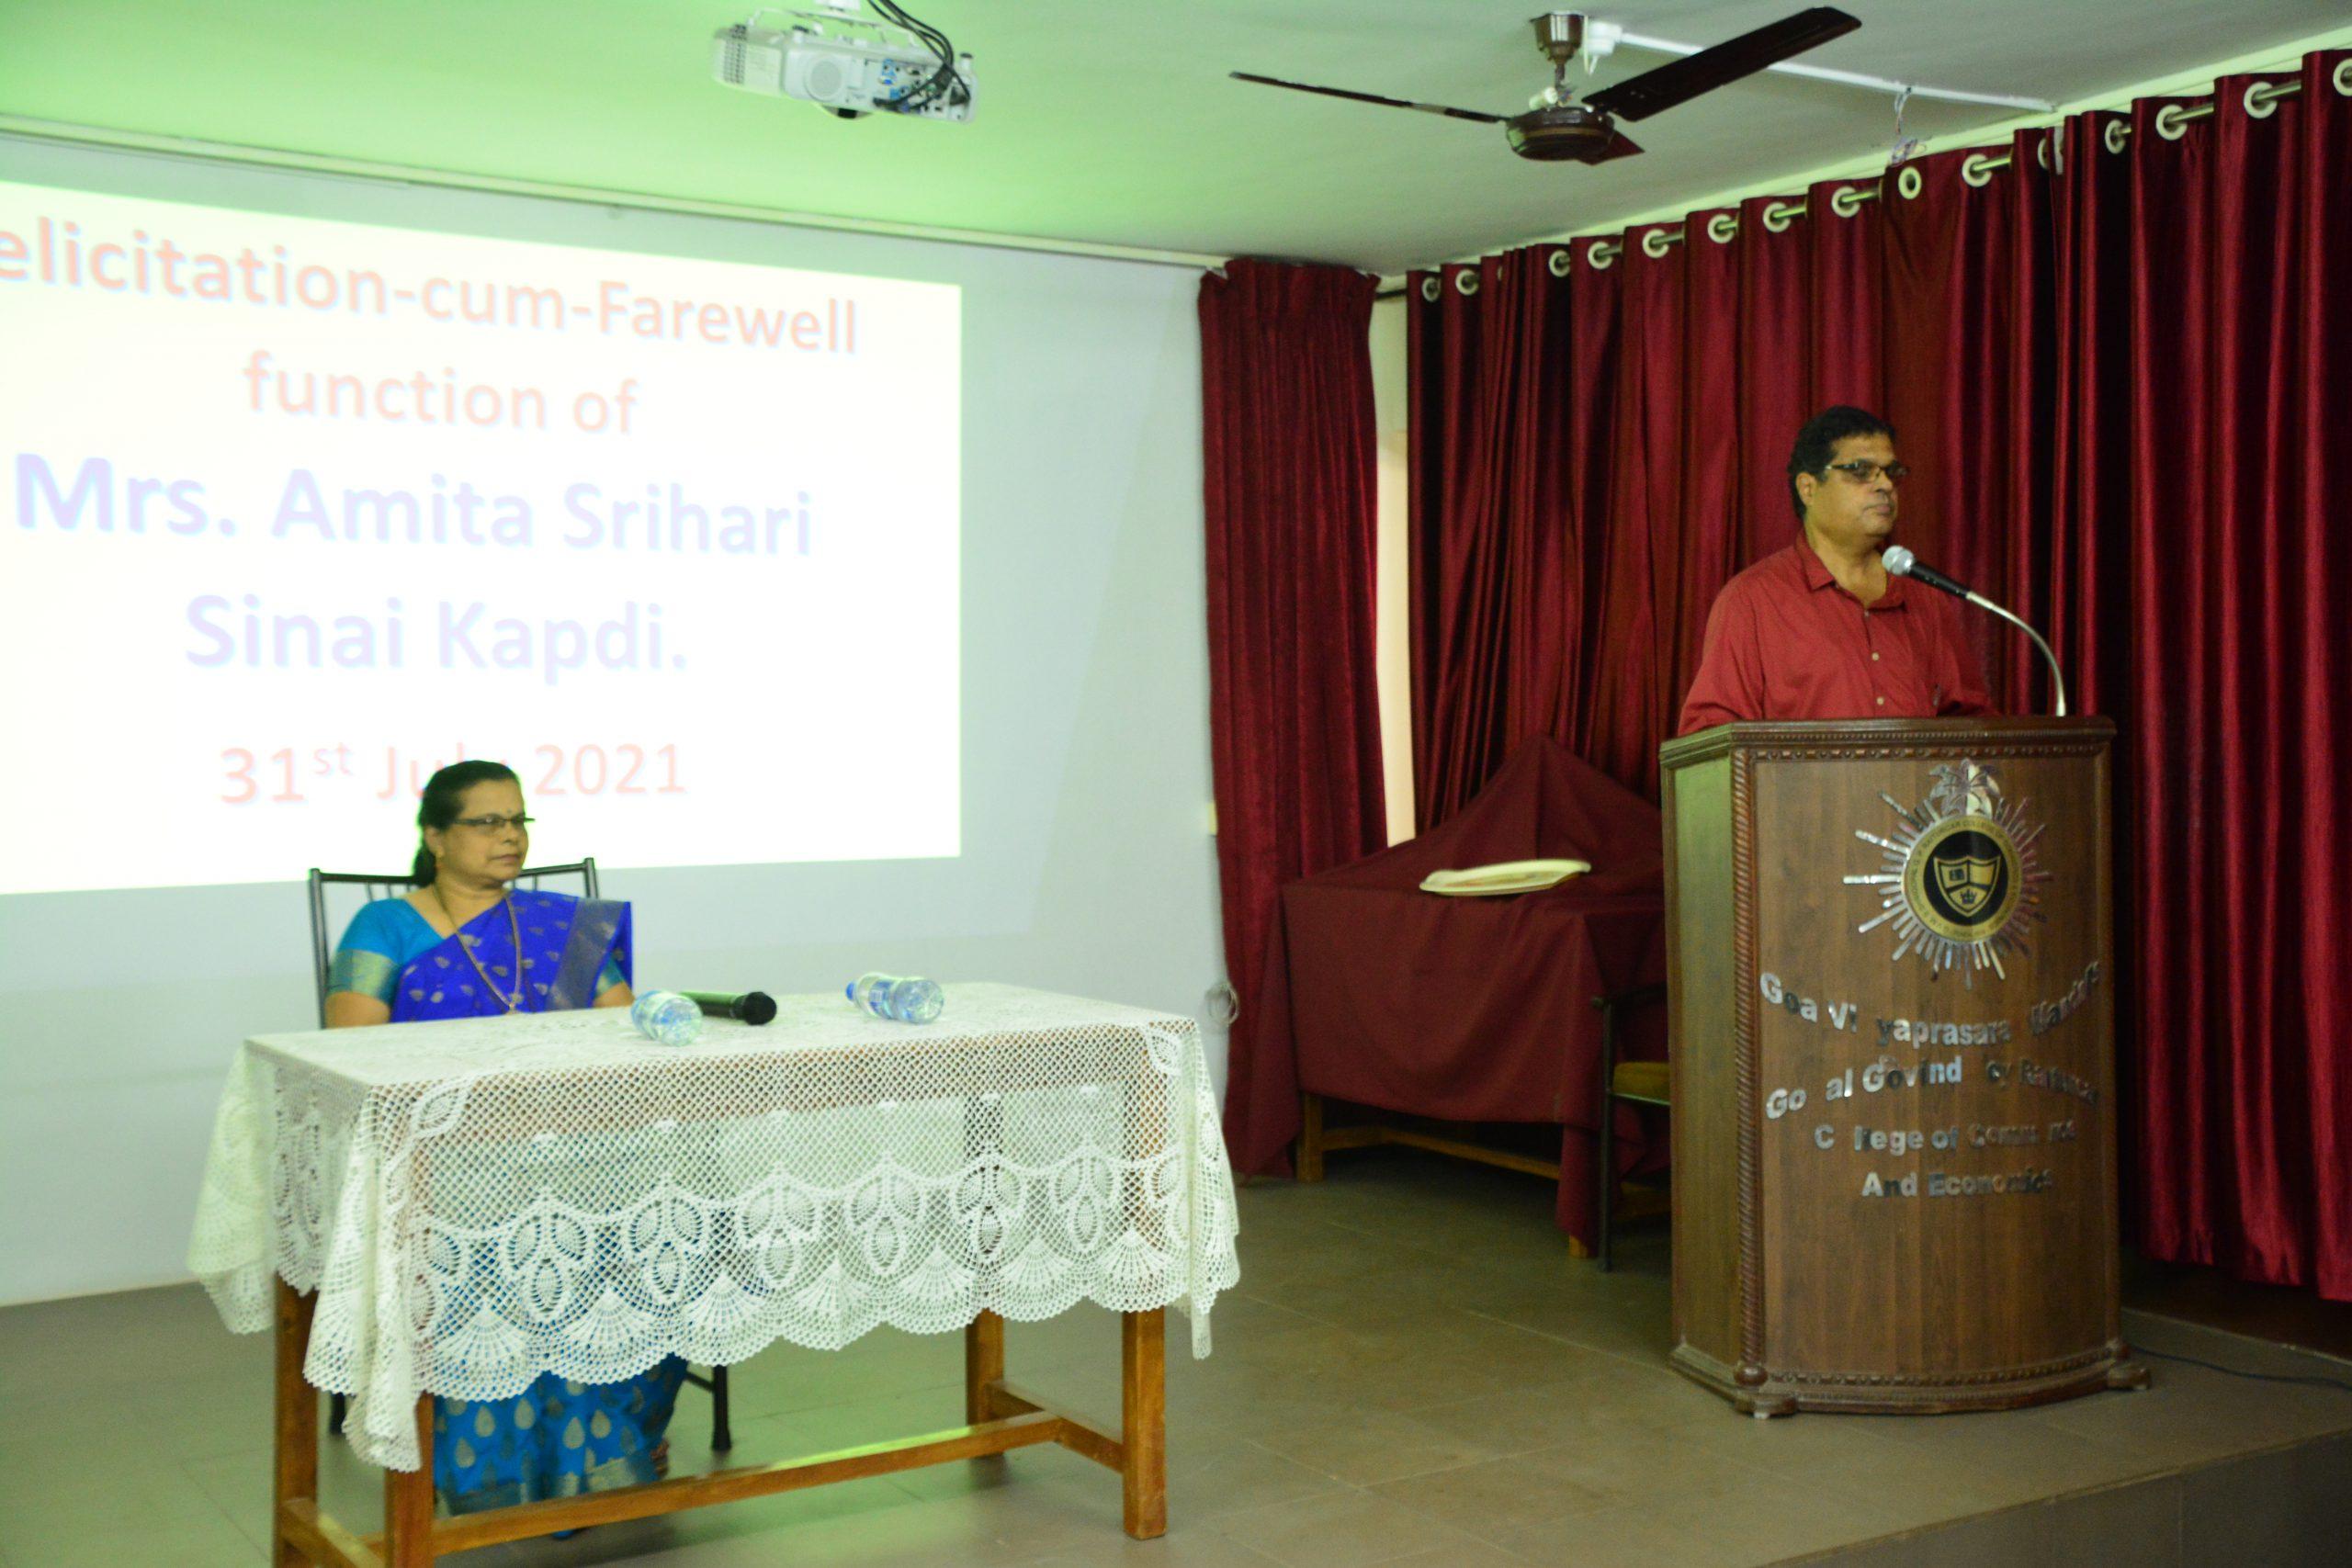 Felicitation-cum-Farewell function of Mrs. Amita Kapdi